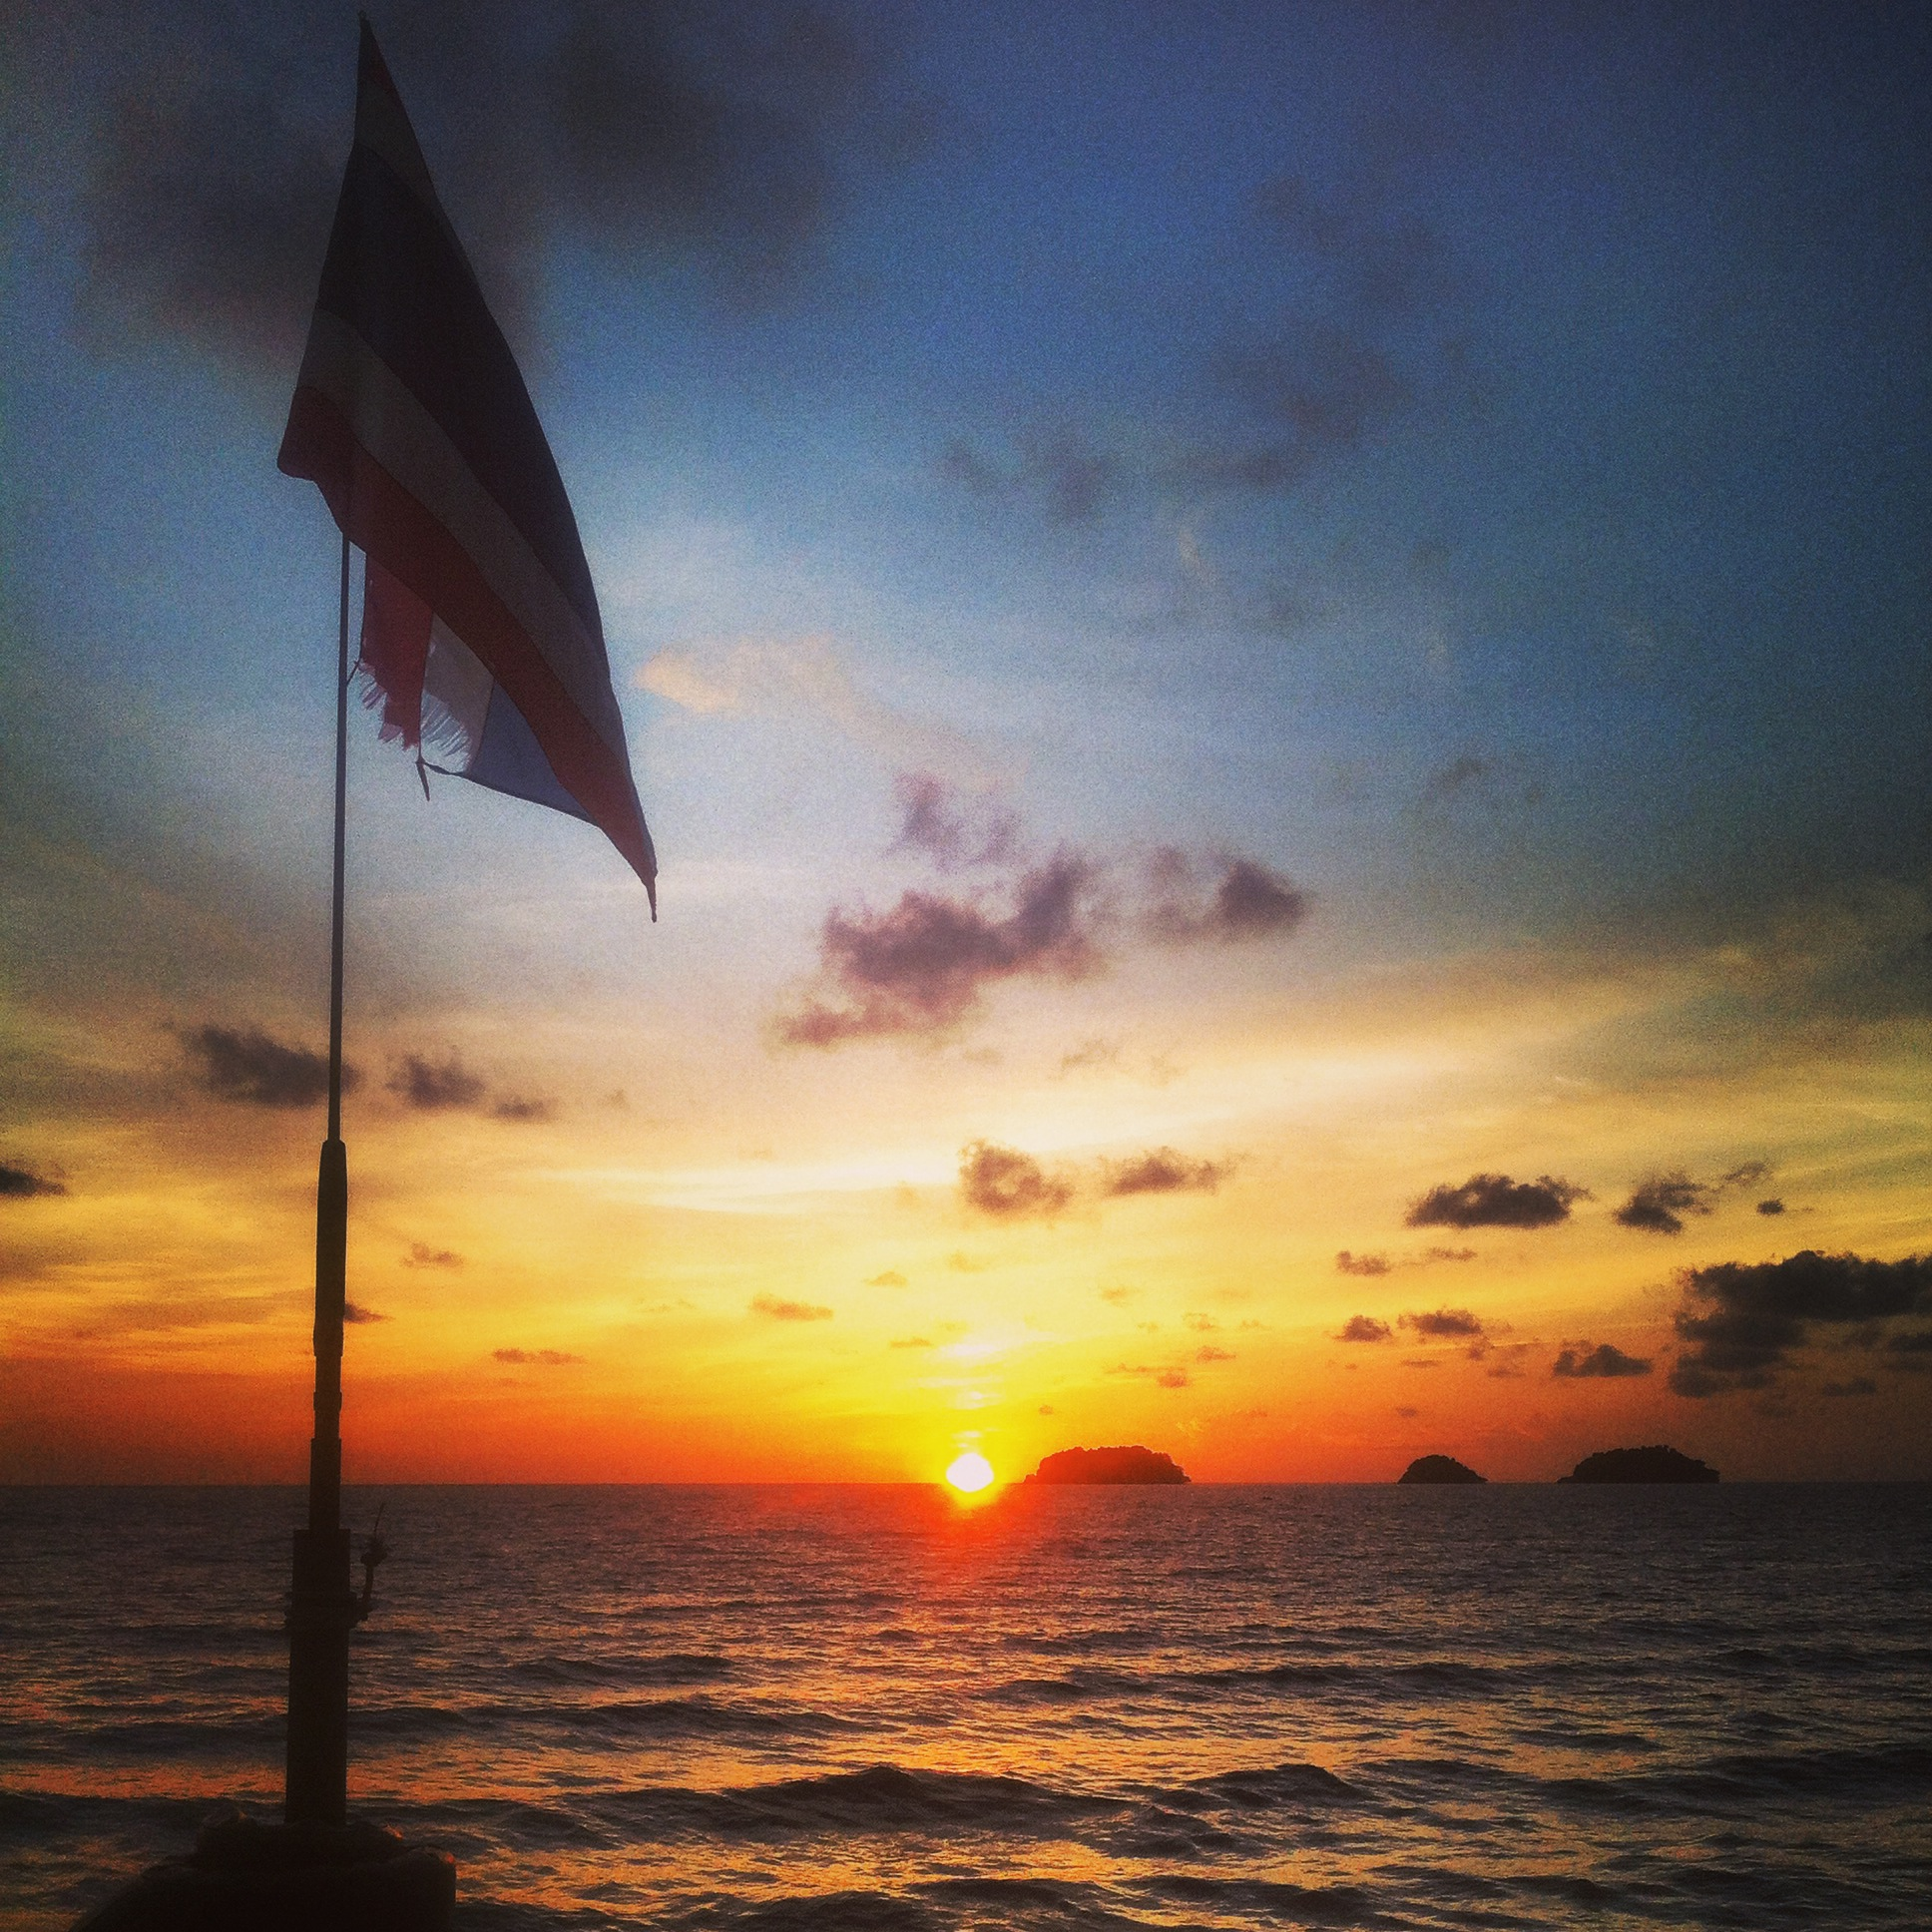 sunset, Koh Chang, Thailand